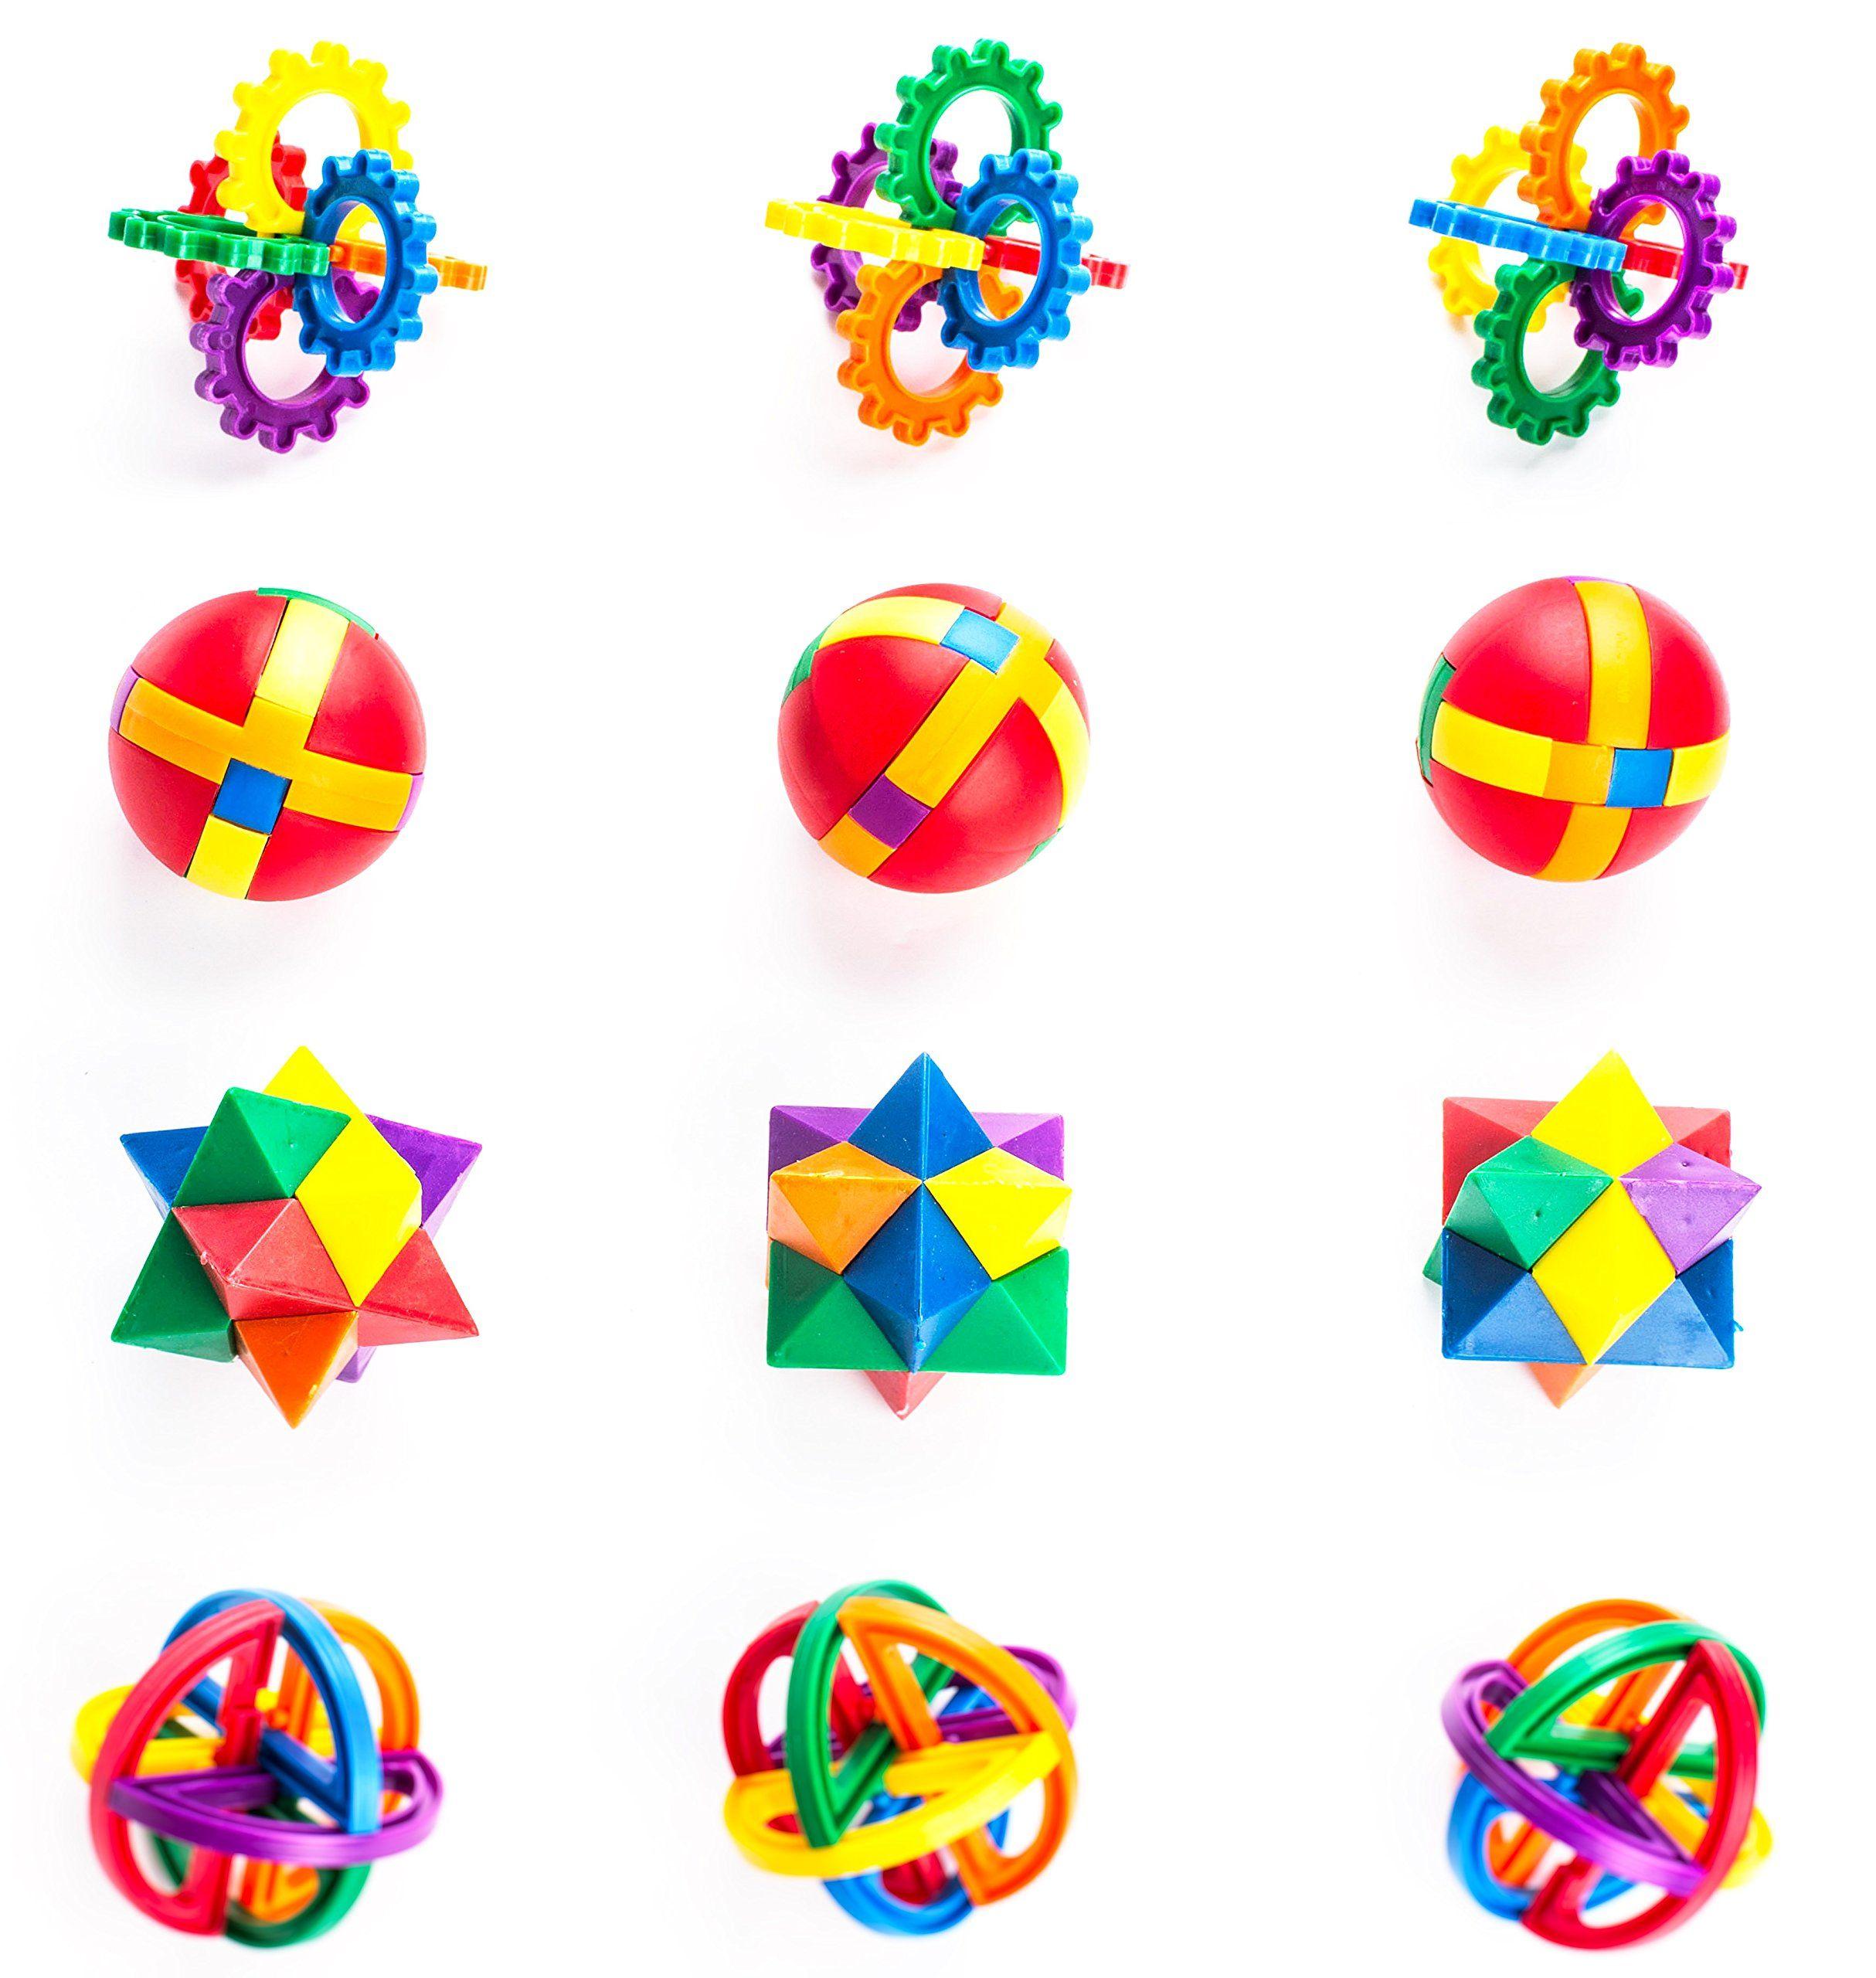 Neliblu Fun Puzzle Balls Goody Bag Fillers Party Favors Party Toys Goody Bag Favors Carnival Prizes Pinata Fille Fun Puzzles Puzzle Ball Brain Teaser Puzzles